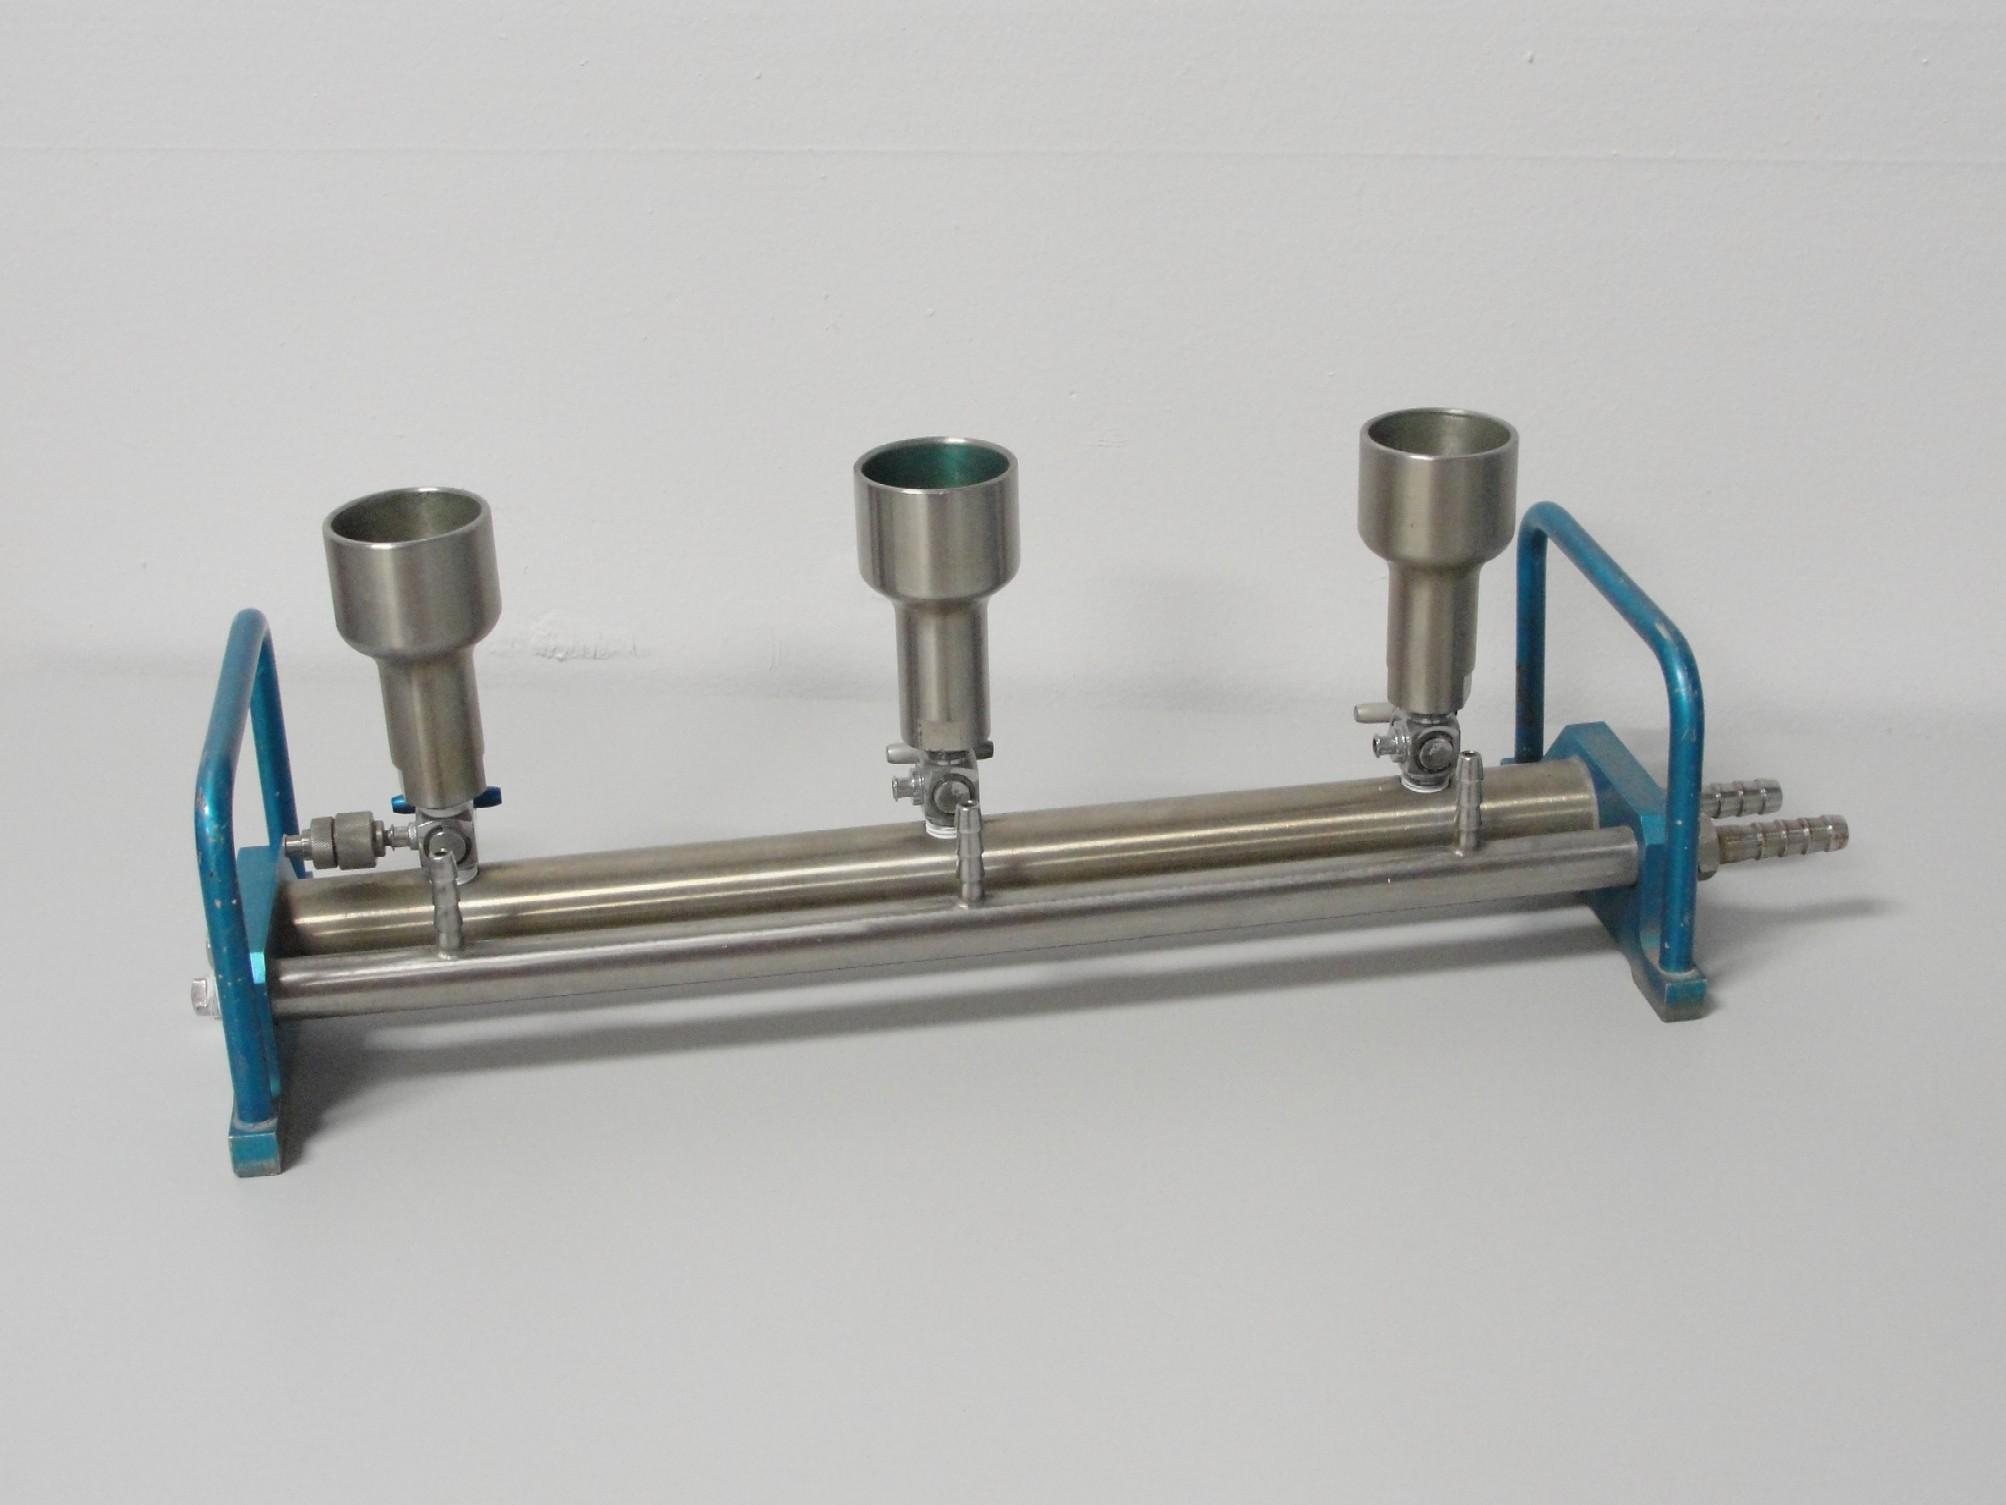 Refurbished hydrosol stainless steel manifold